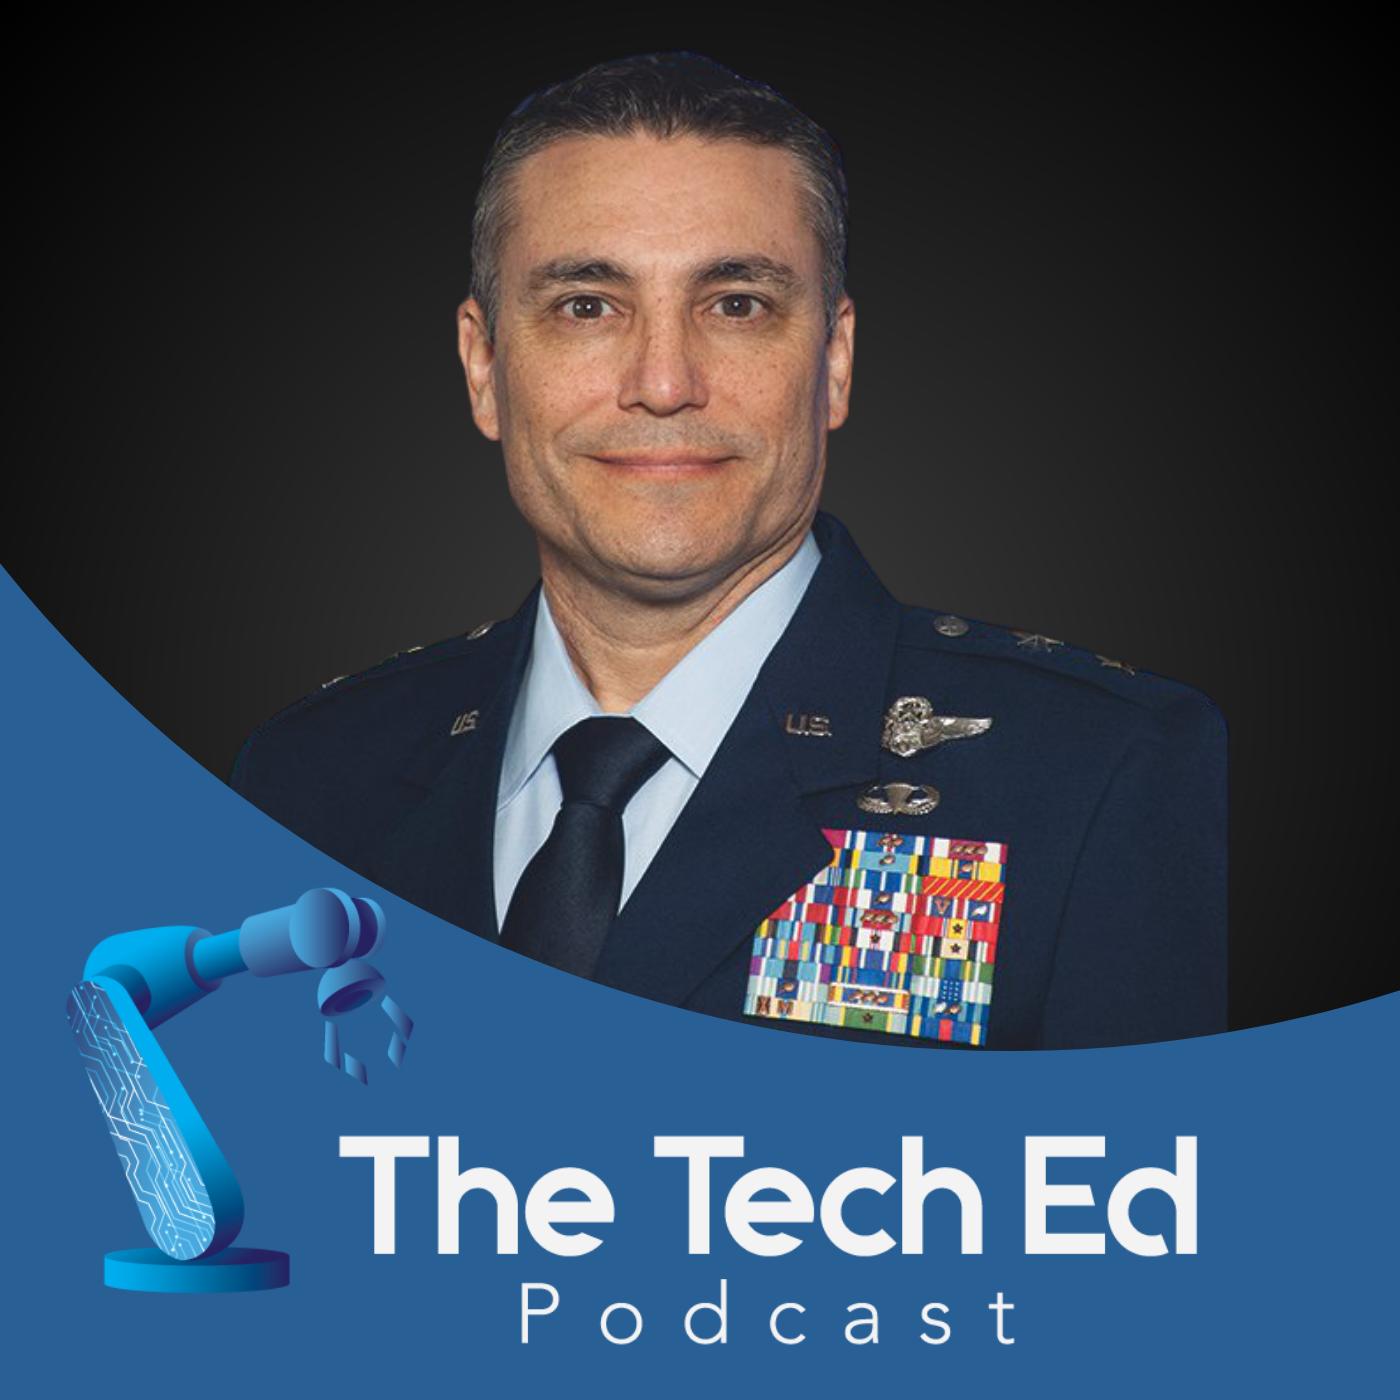 Maj Gen Paul Knapp on The TechEd Podcast